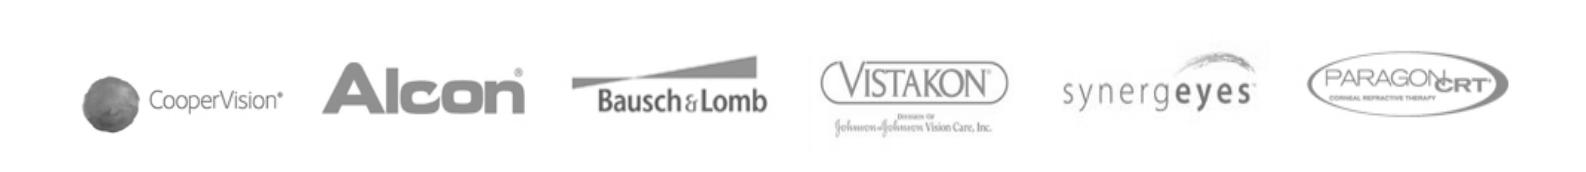 contact lens logos